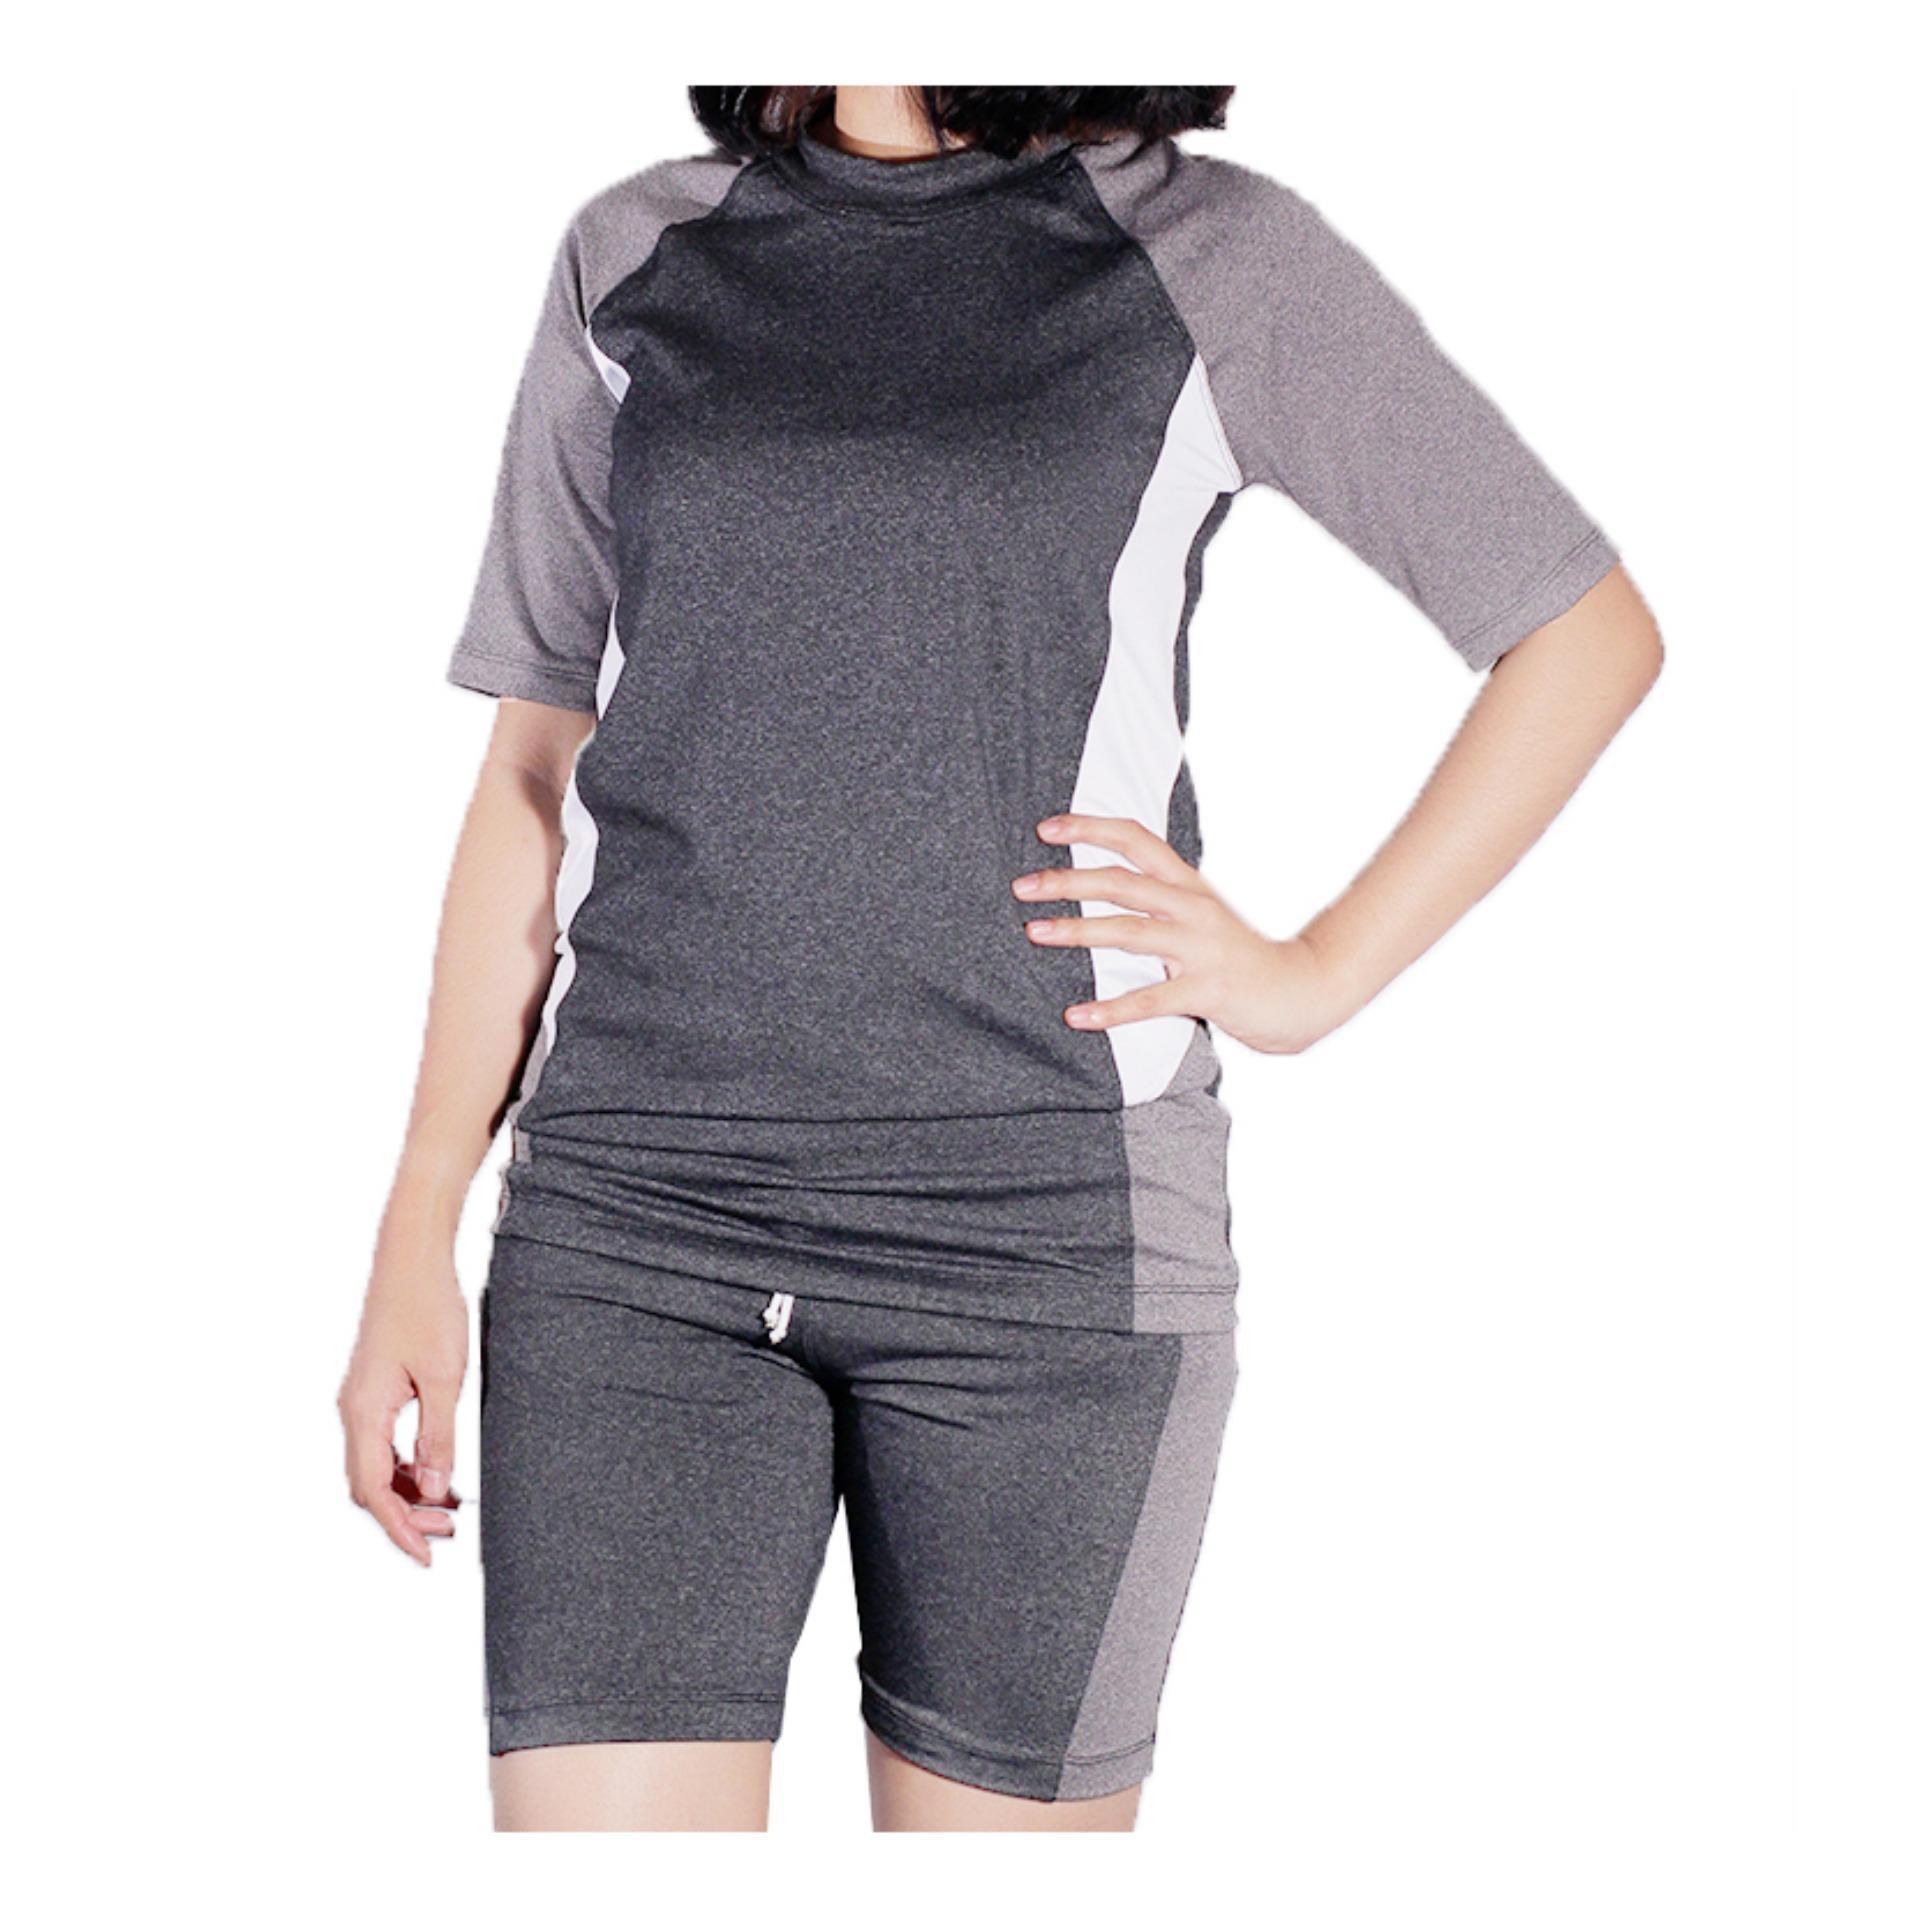 Mall BTM Fashion - Diana Baju Renang Atasan Dan Bawahan Pendek Kombinasi Warna Harga Murah - Abu-abu Tua